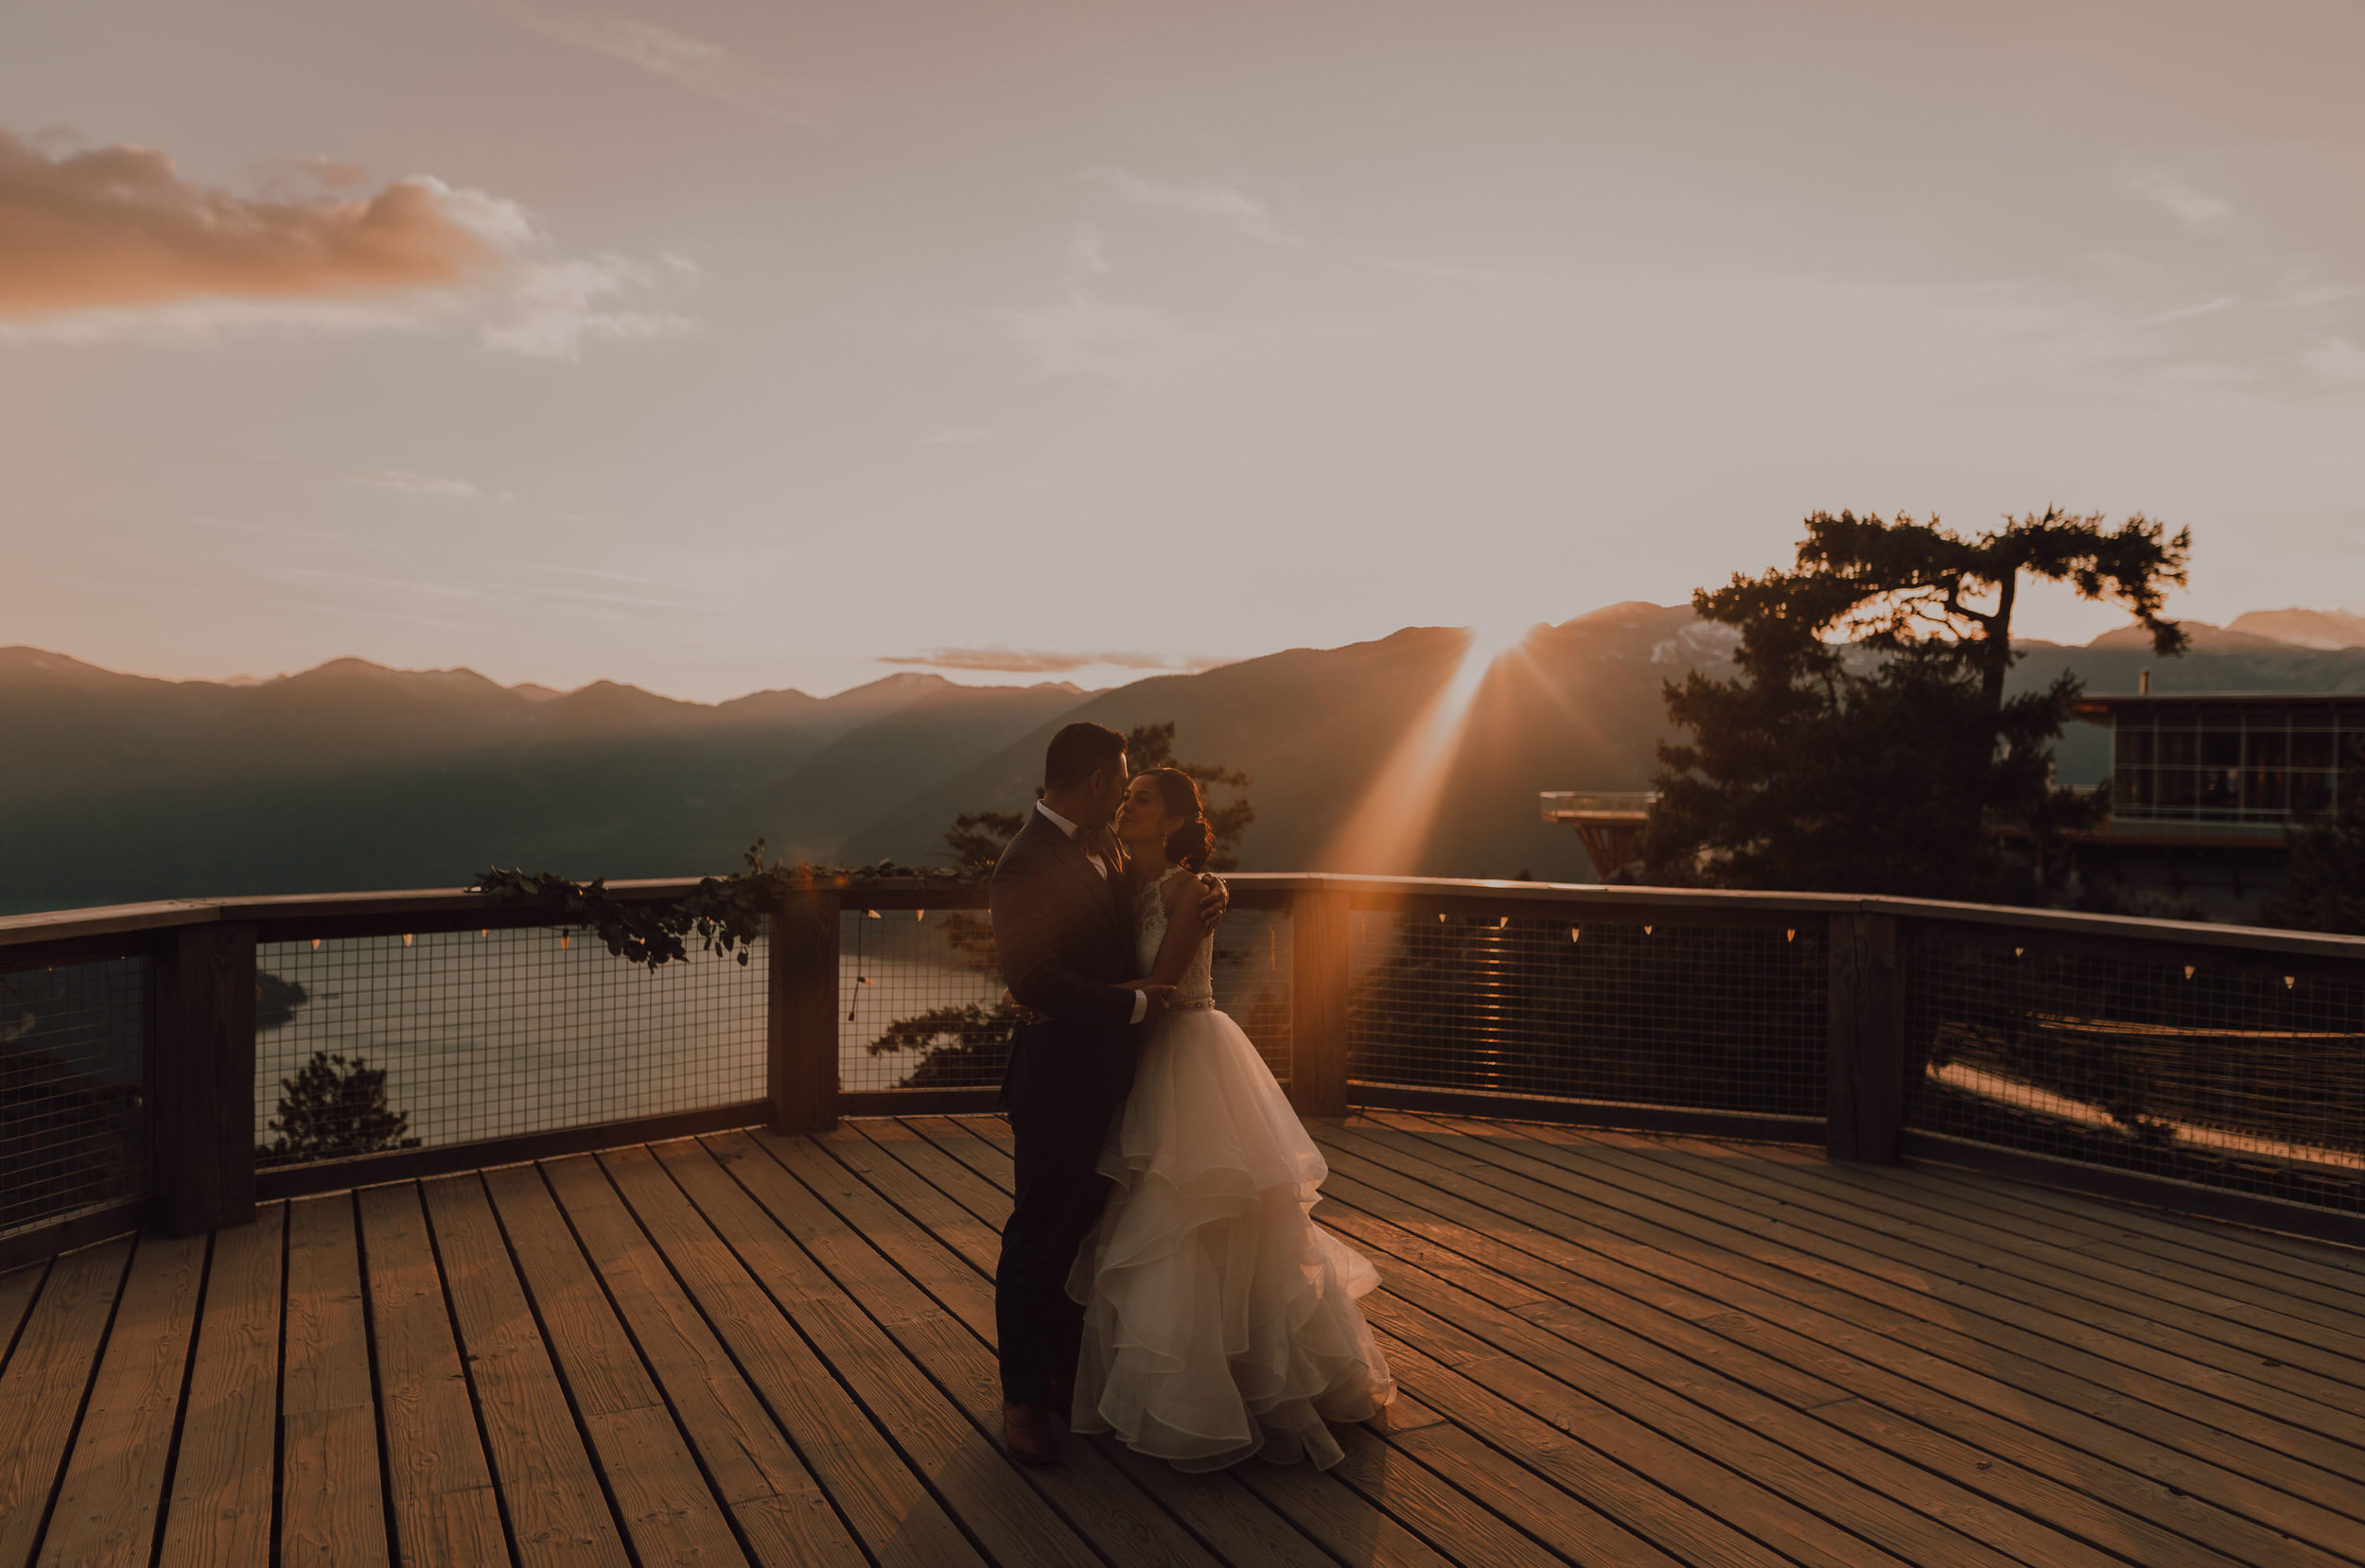 Squamish Wedding Photographer - Sea to Sky Gondola Wedding Photos -  Vancouver Wedding Photographer & Videographer - Sunshine Coast Wedding Photos - Sunshine Coast Wedding Photographer - Jennifer Picard Photography - IMG_5202.jpg